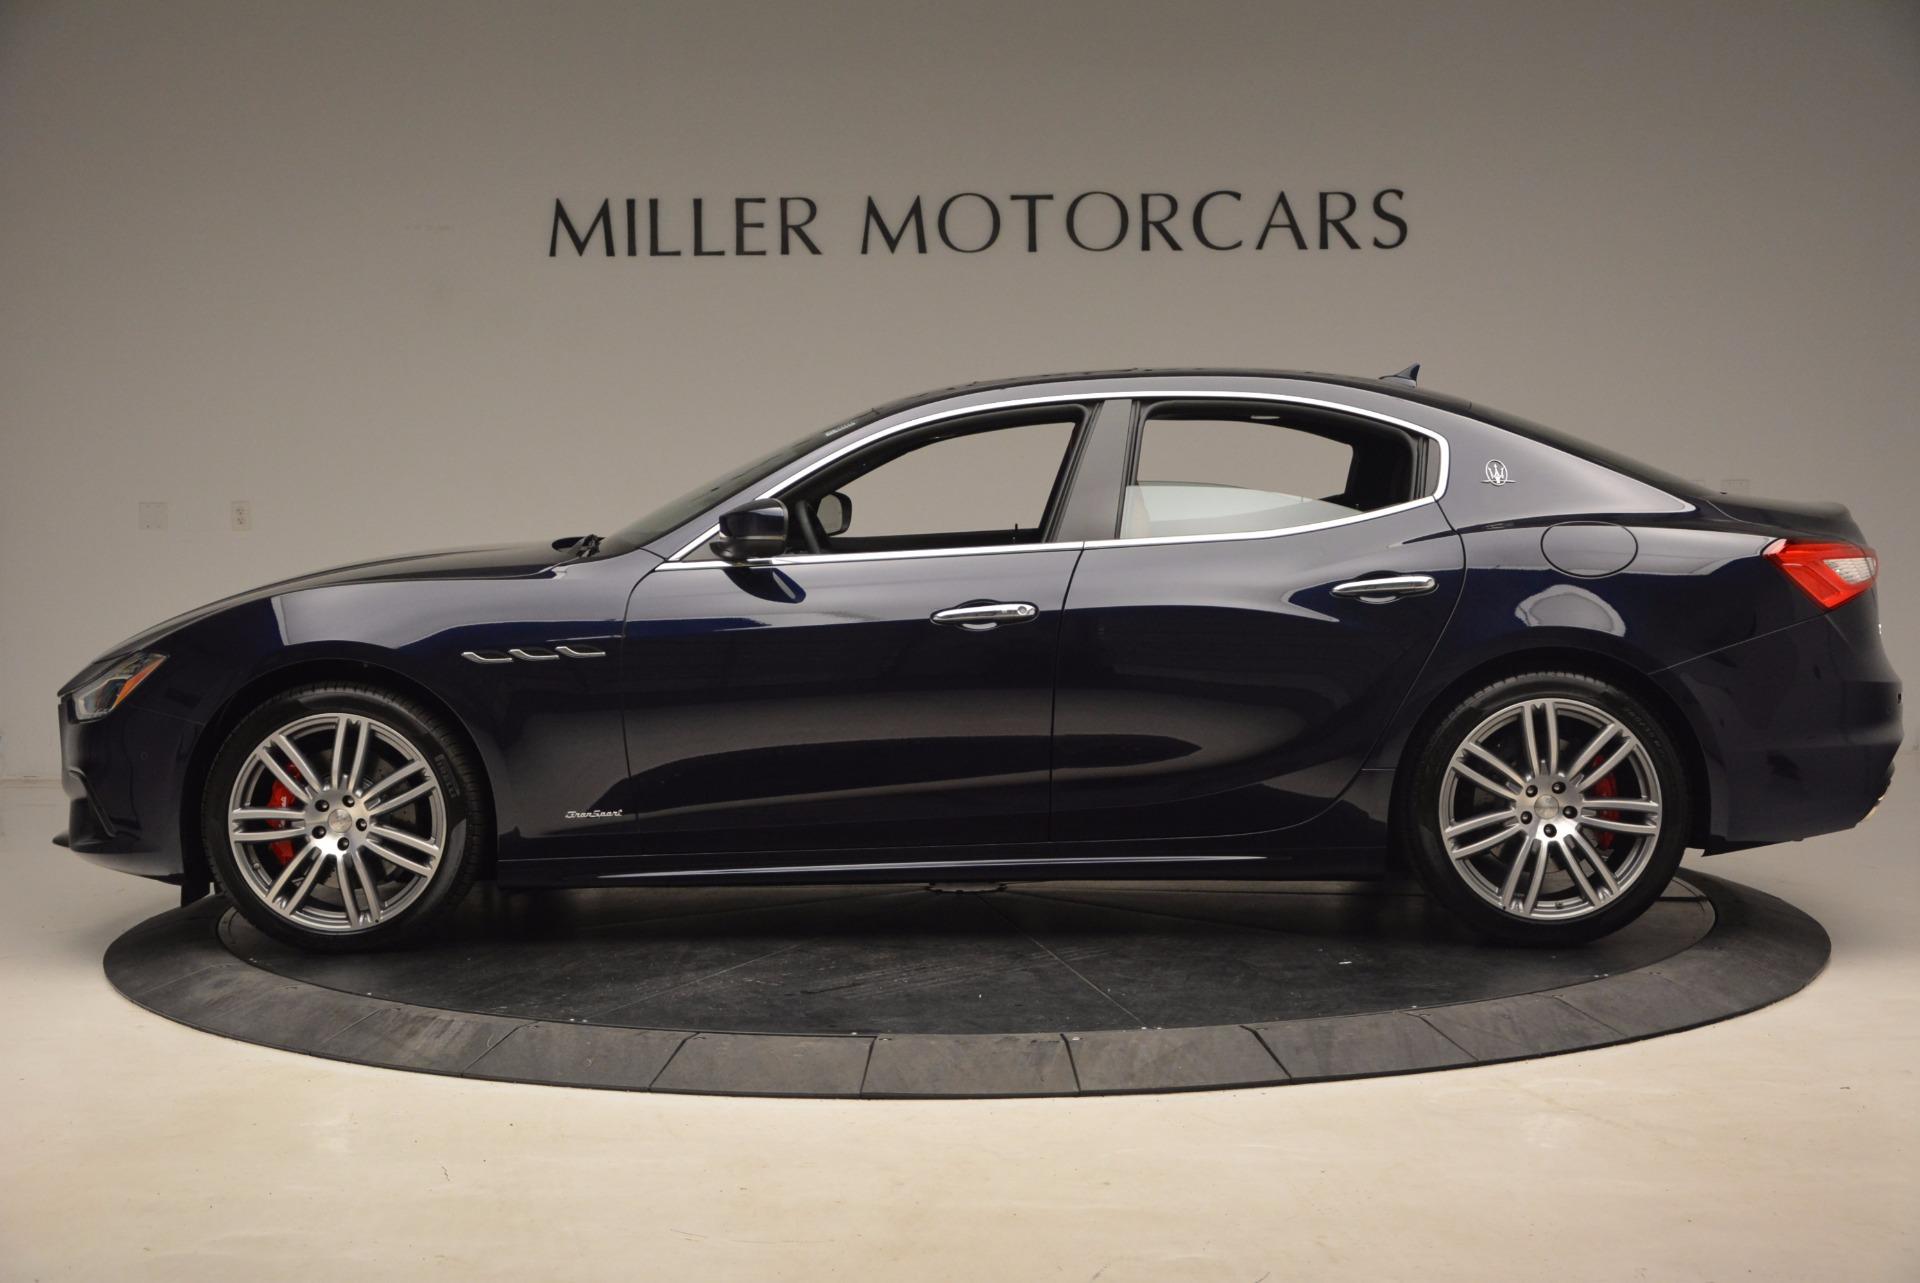 New 2018 Maserati Ghibli S Q4 Gransport For Sale In Greenwich, CT 1562_p3